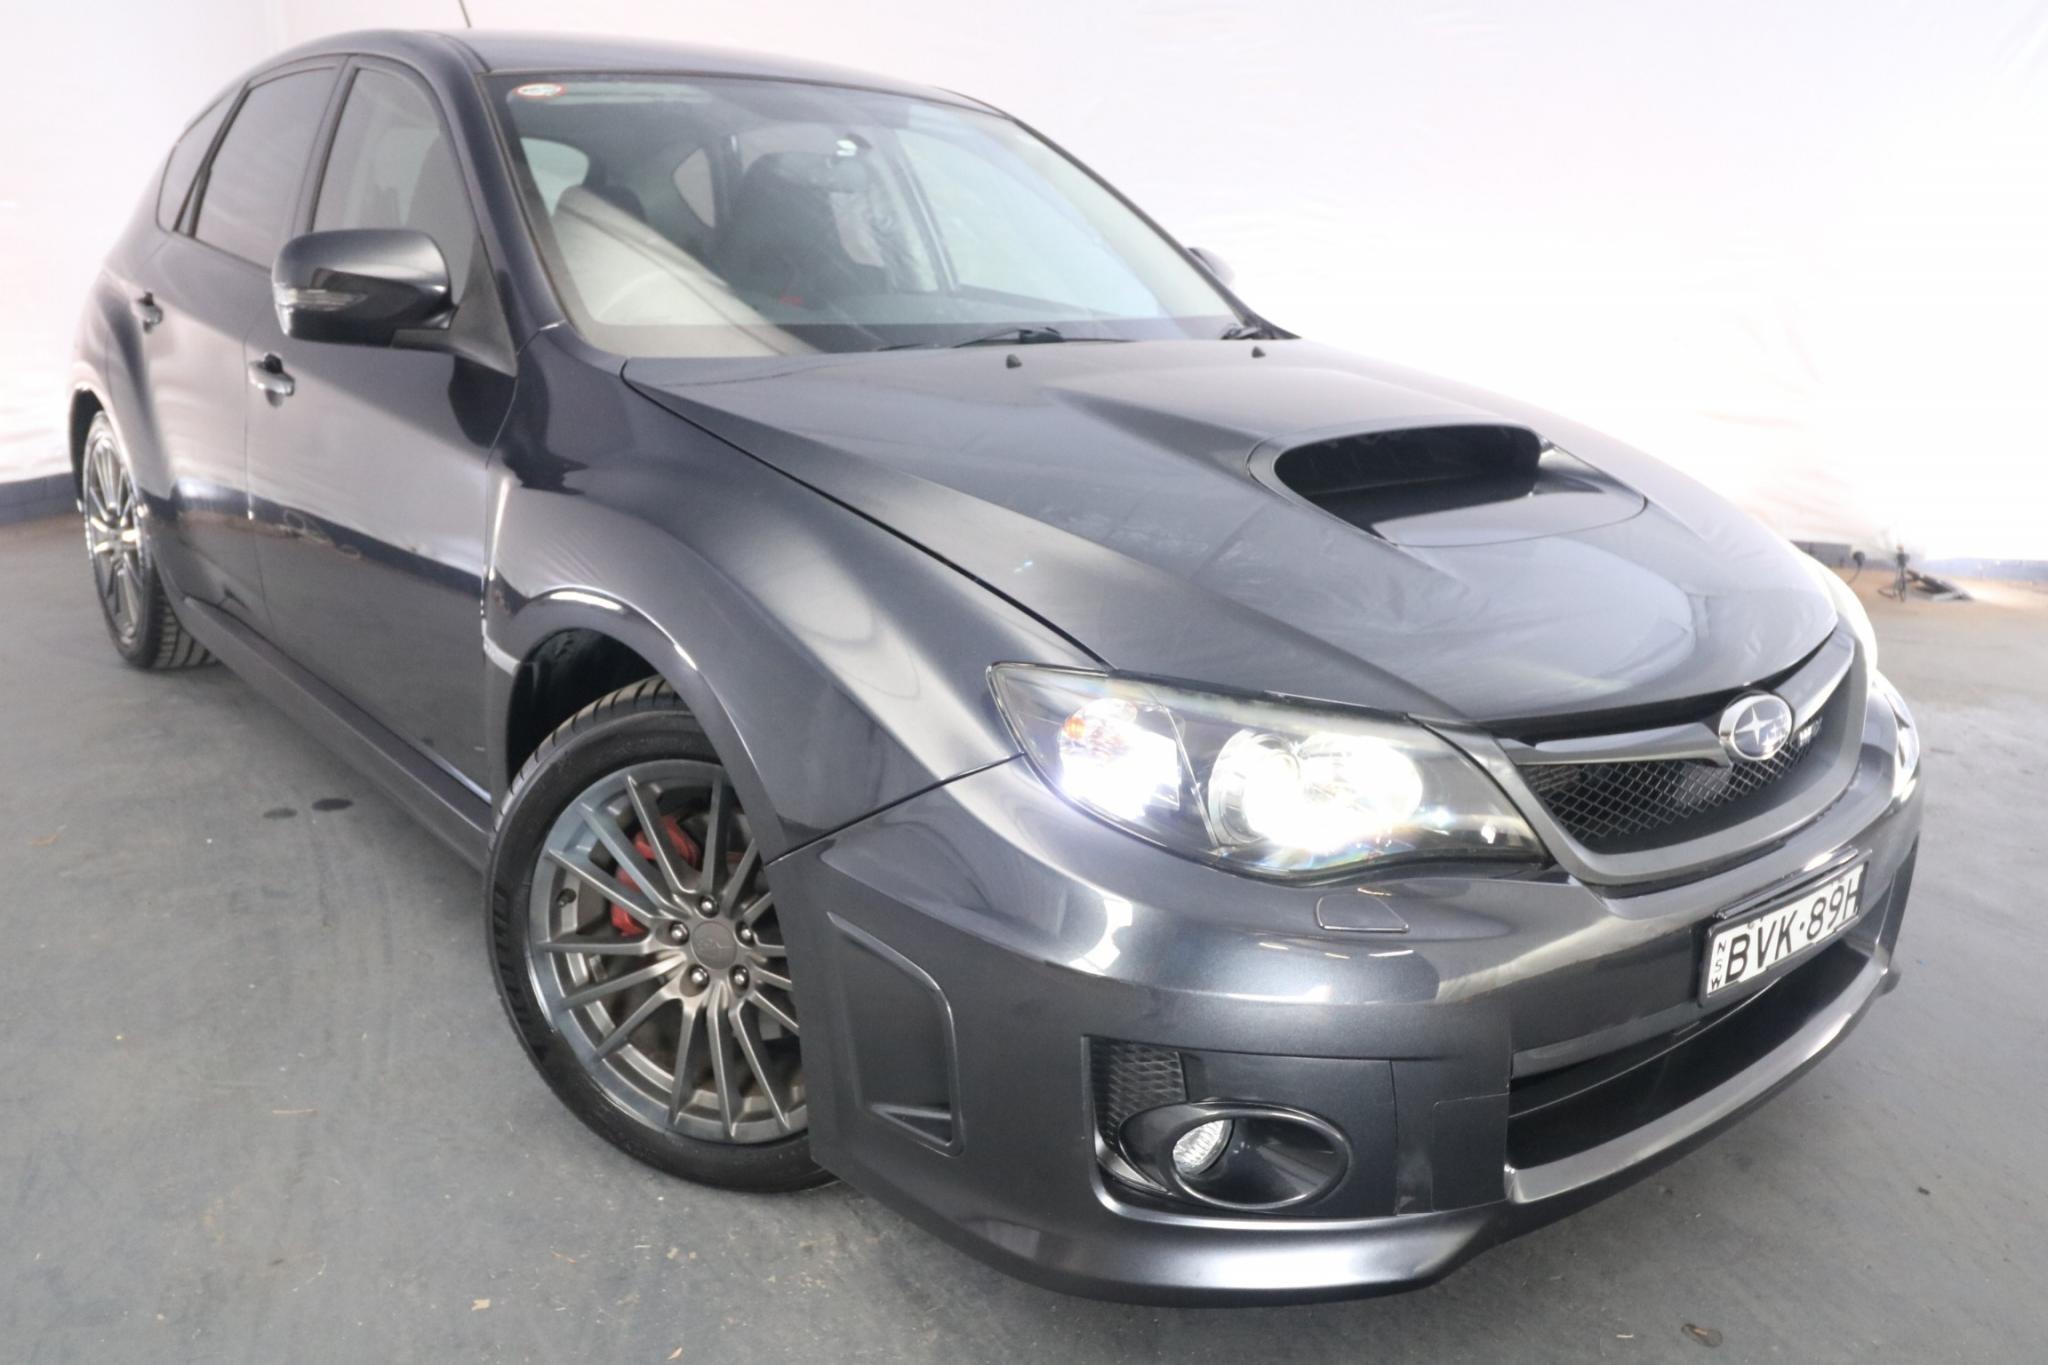 2011 Subaru Impreza WRX MY11 / 5 Speed Manual / Hatchback / 2.5L / 4 Cylinder TURBO / Petrol / 4x4 / 5 door / Model Year '11 July release KTD11A